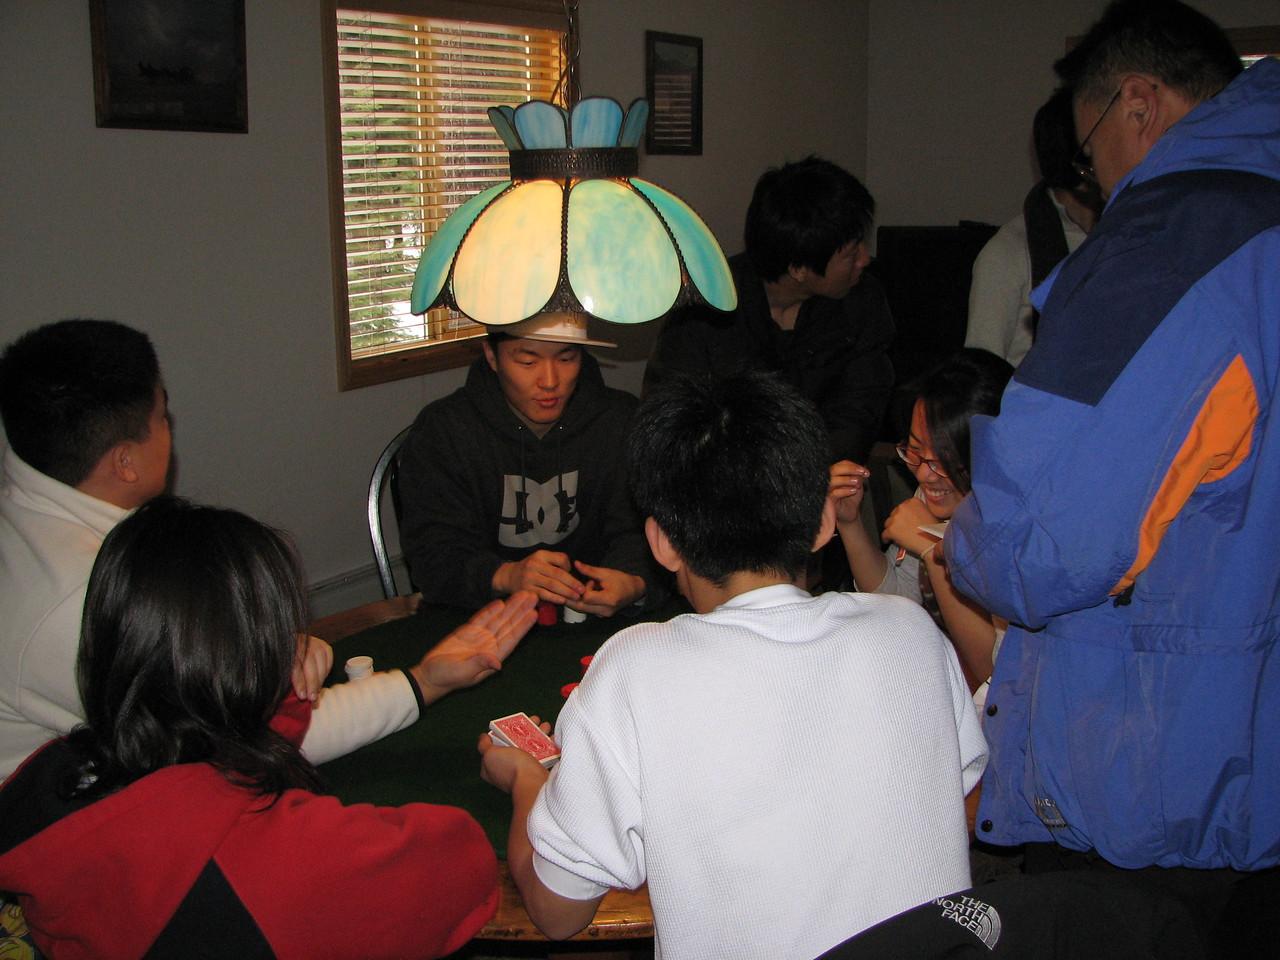 2006 12 20 Wed - Dan Tung, Angela Hsu, Ted Hong, Jay Lee, Shinae Kim, & Soojin Choi gamble